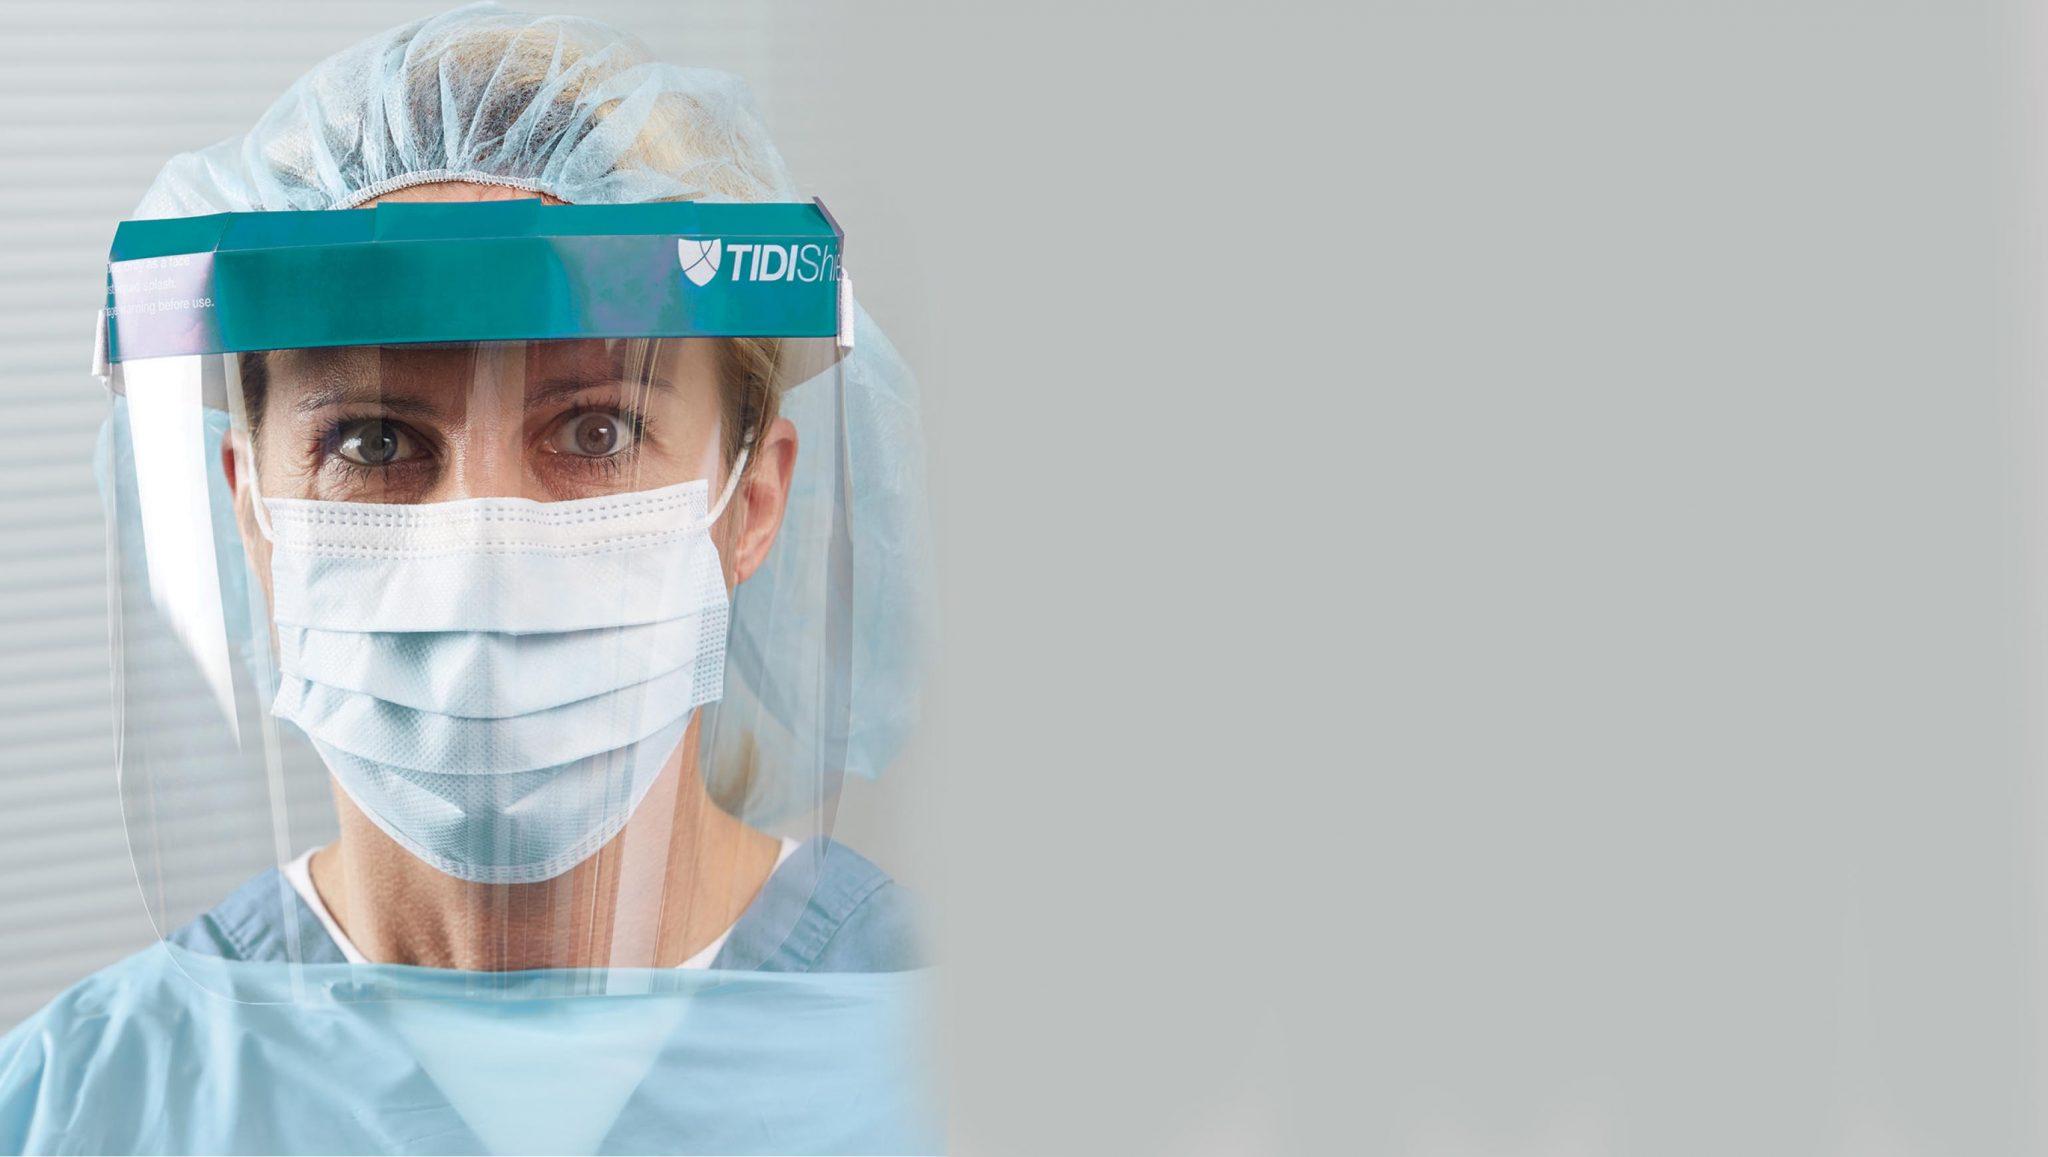 TIDI Protective Eyewear image cover